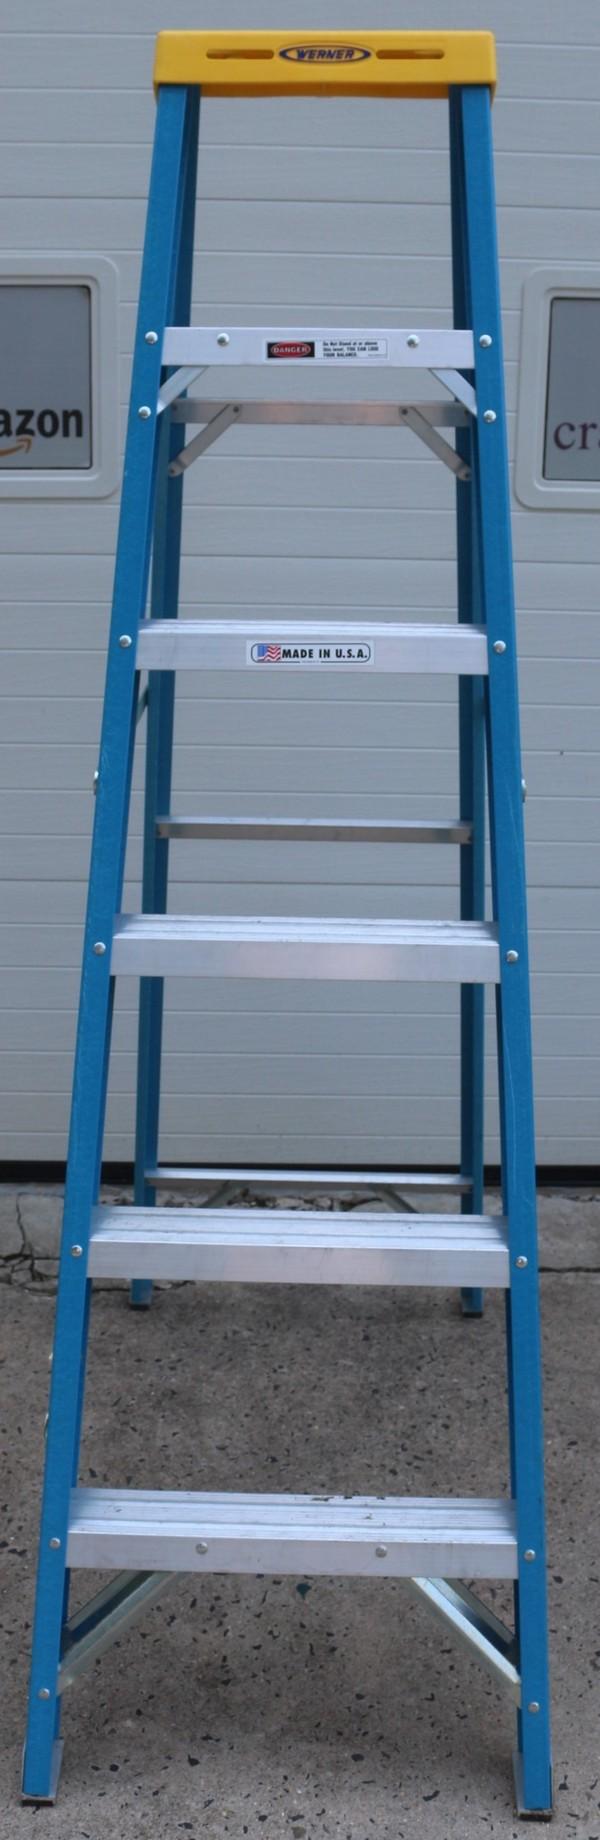 Heavy Duty Fiberglass : Werner ft ladder non conductive fiberglass heavy